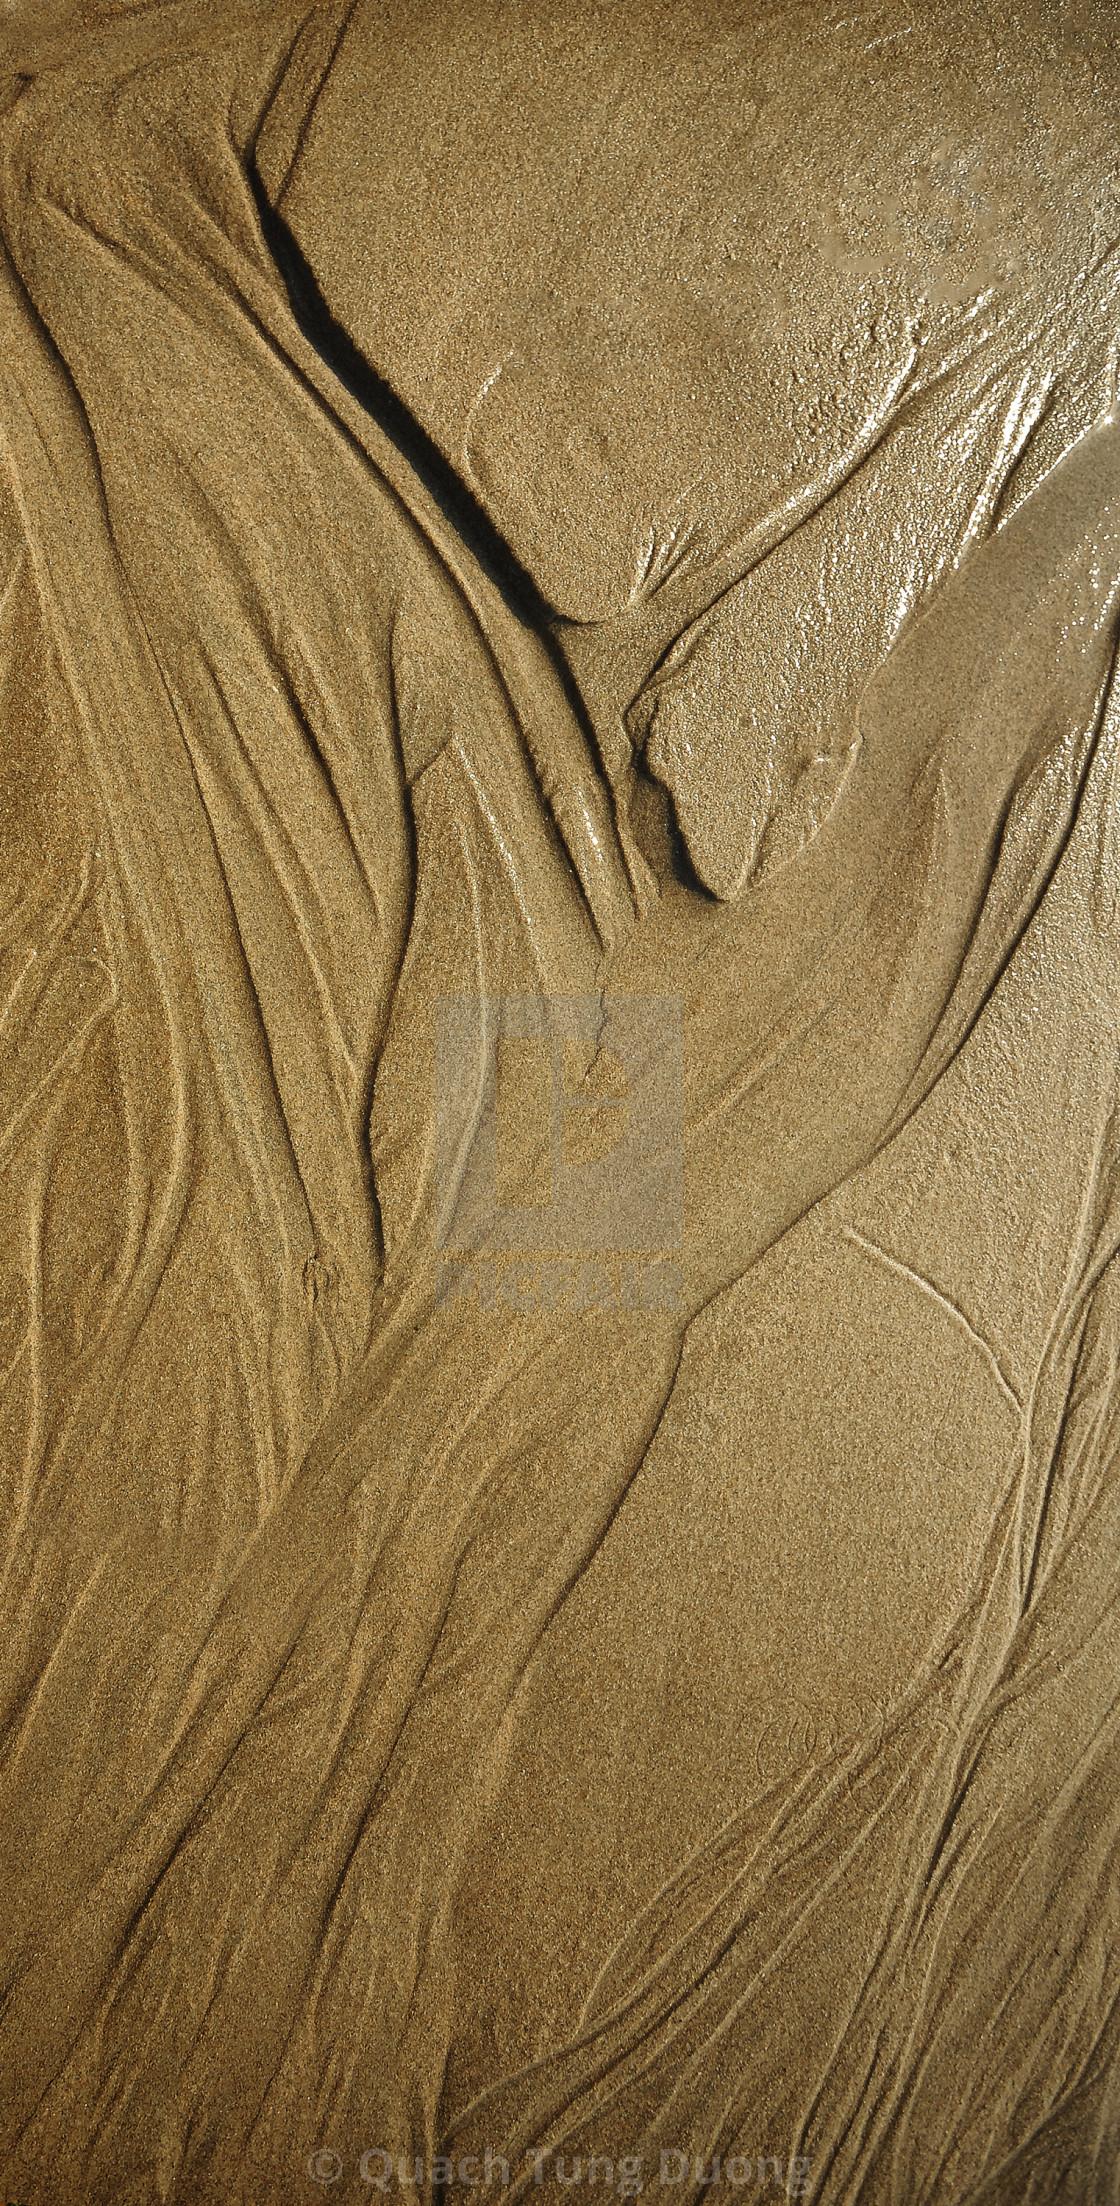 """Nauture Art On the Sand"" stock image"